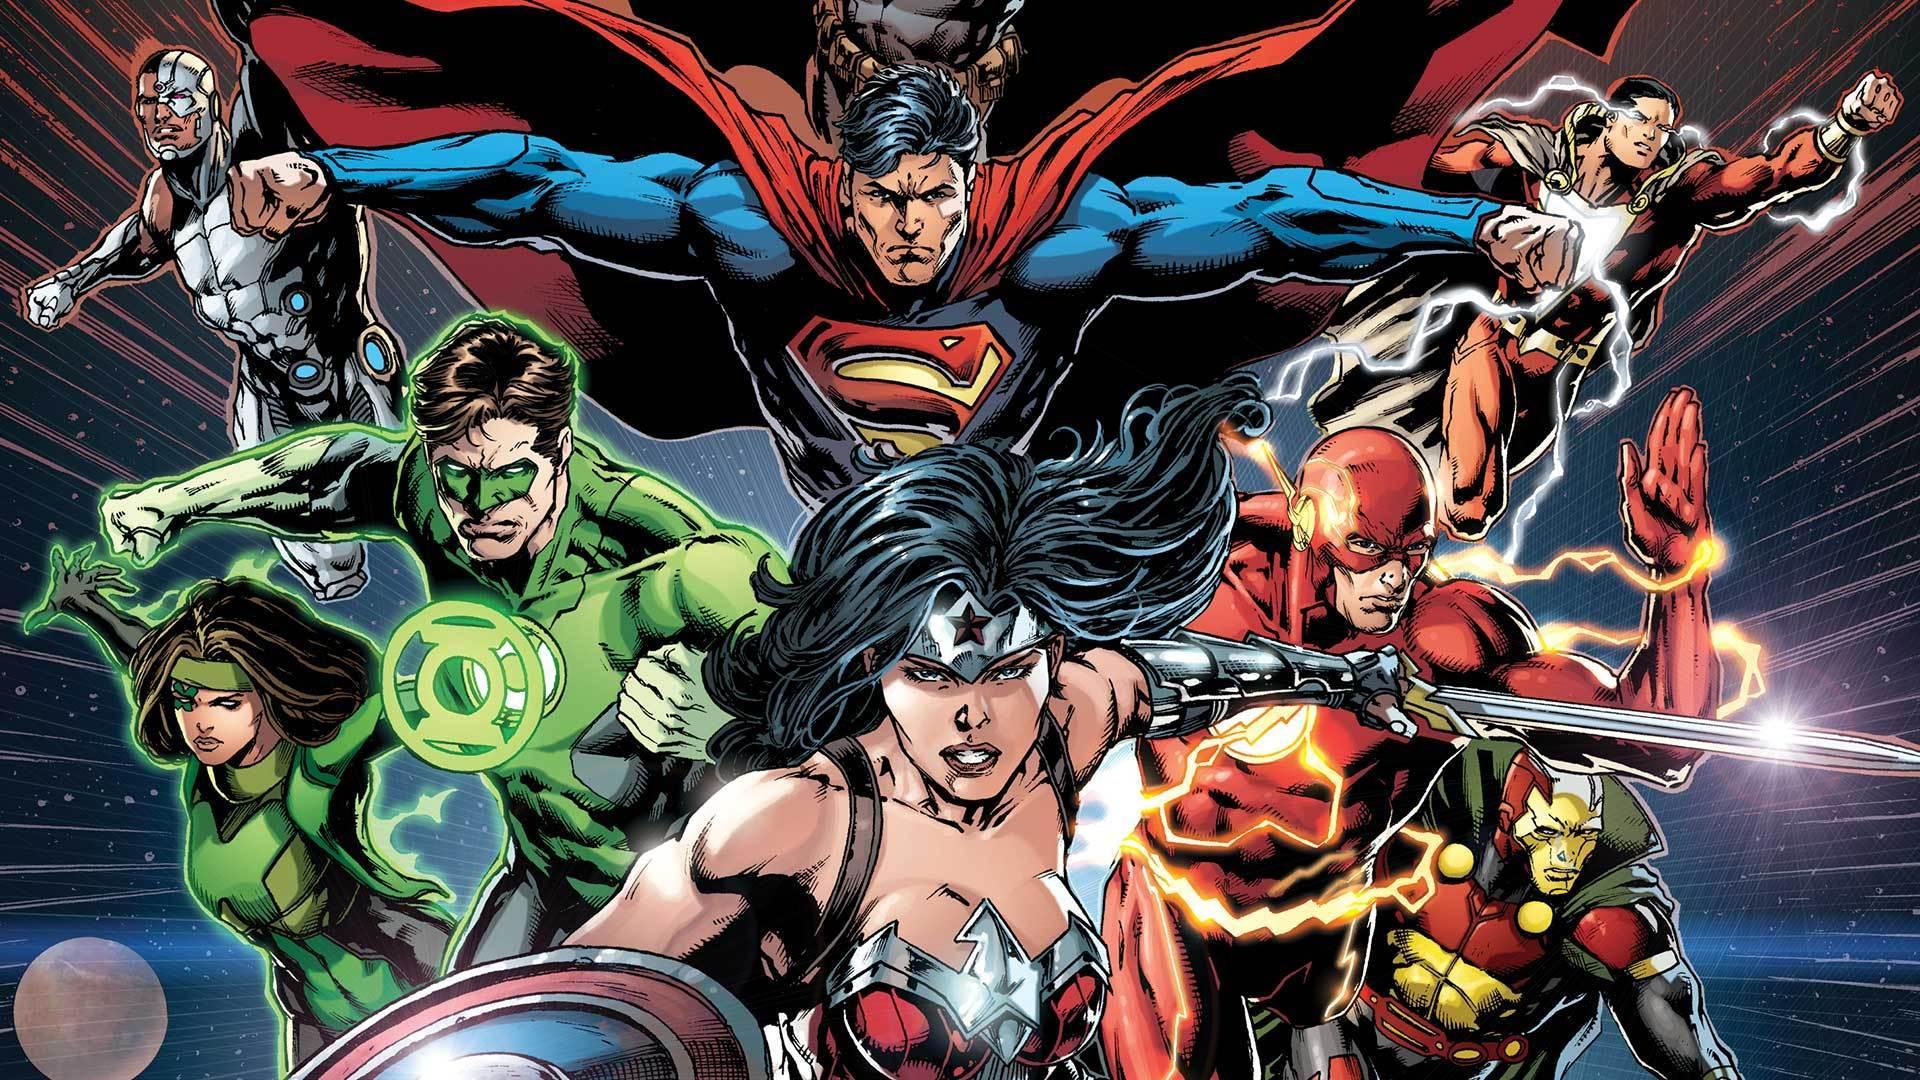 Justice League Villains Wallpapers - Wallpaper Cave